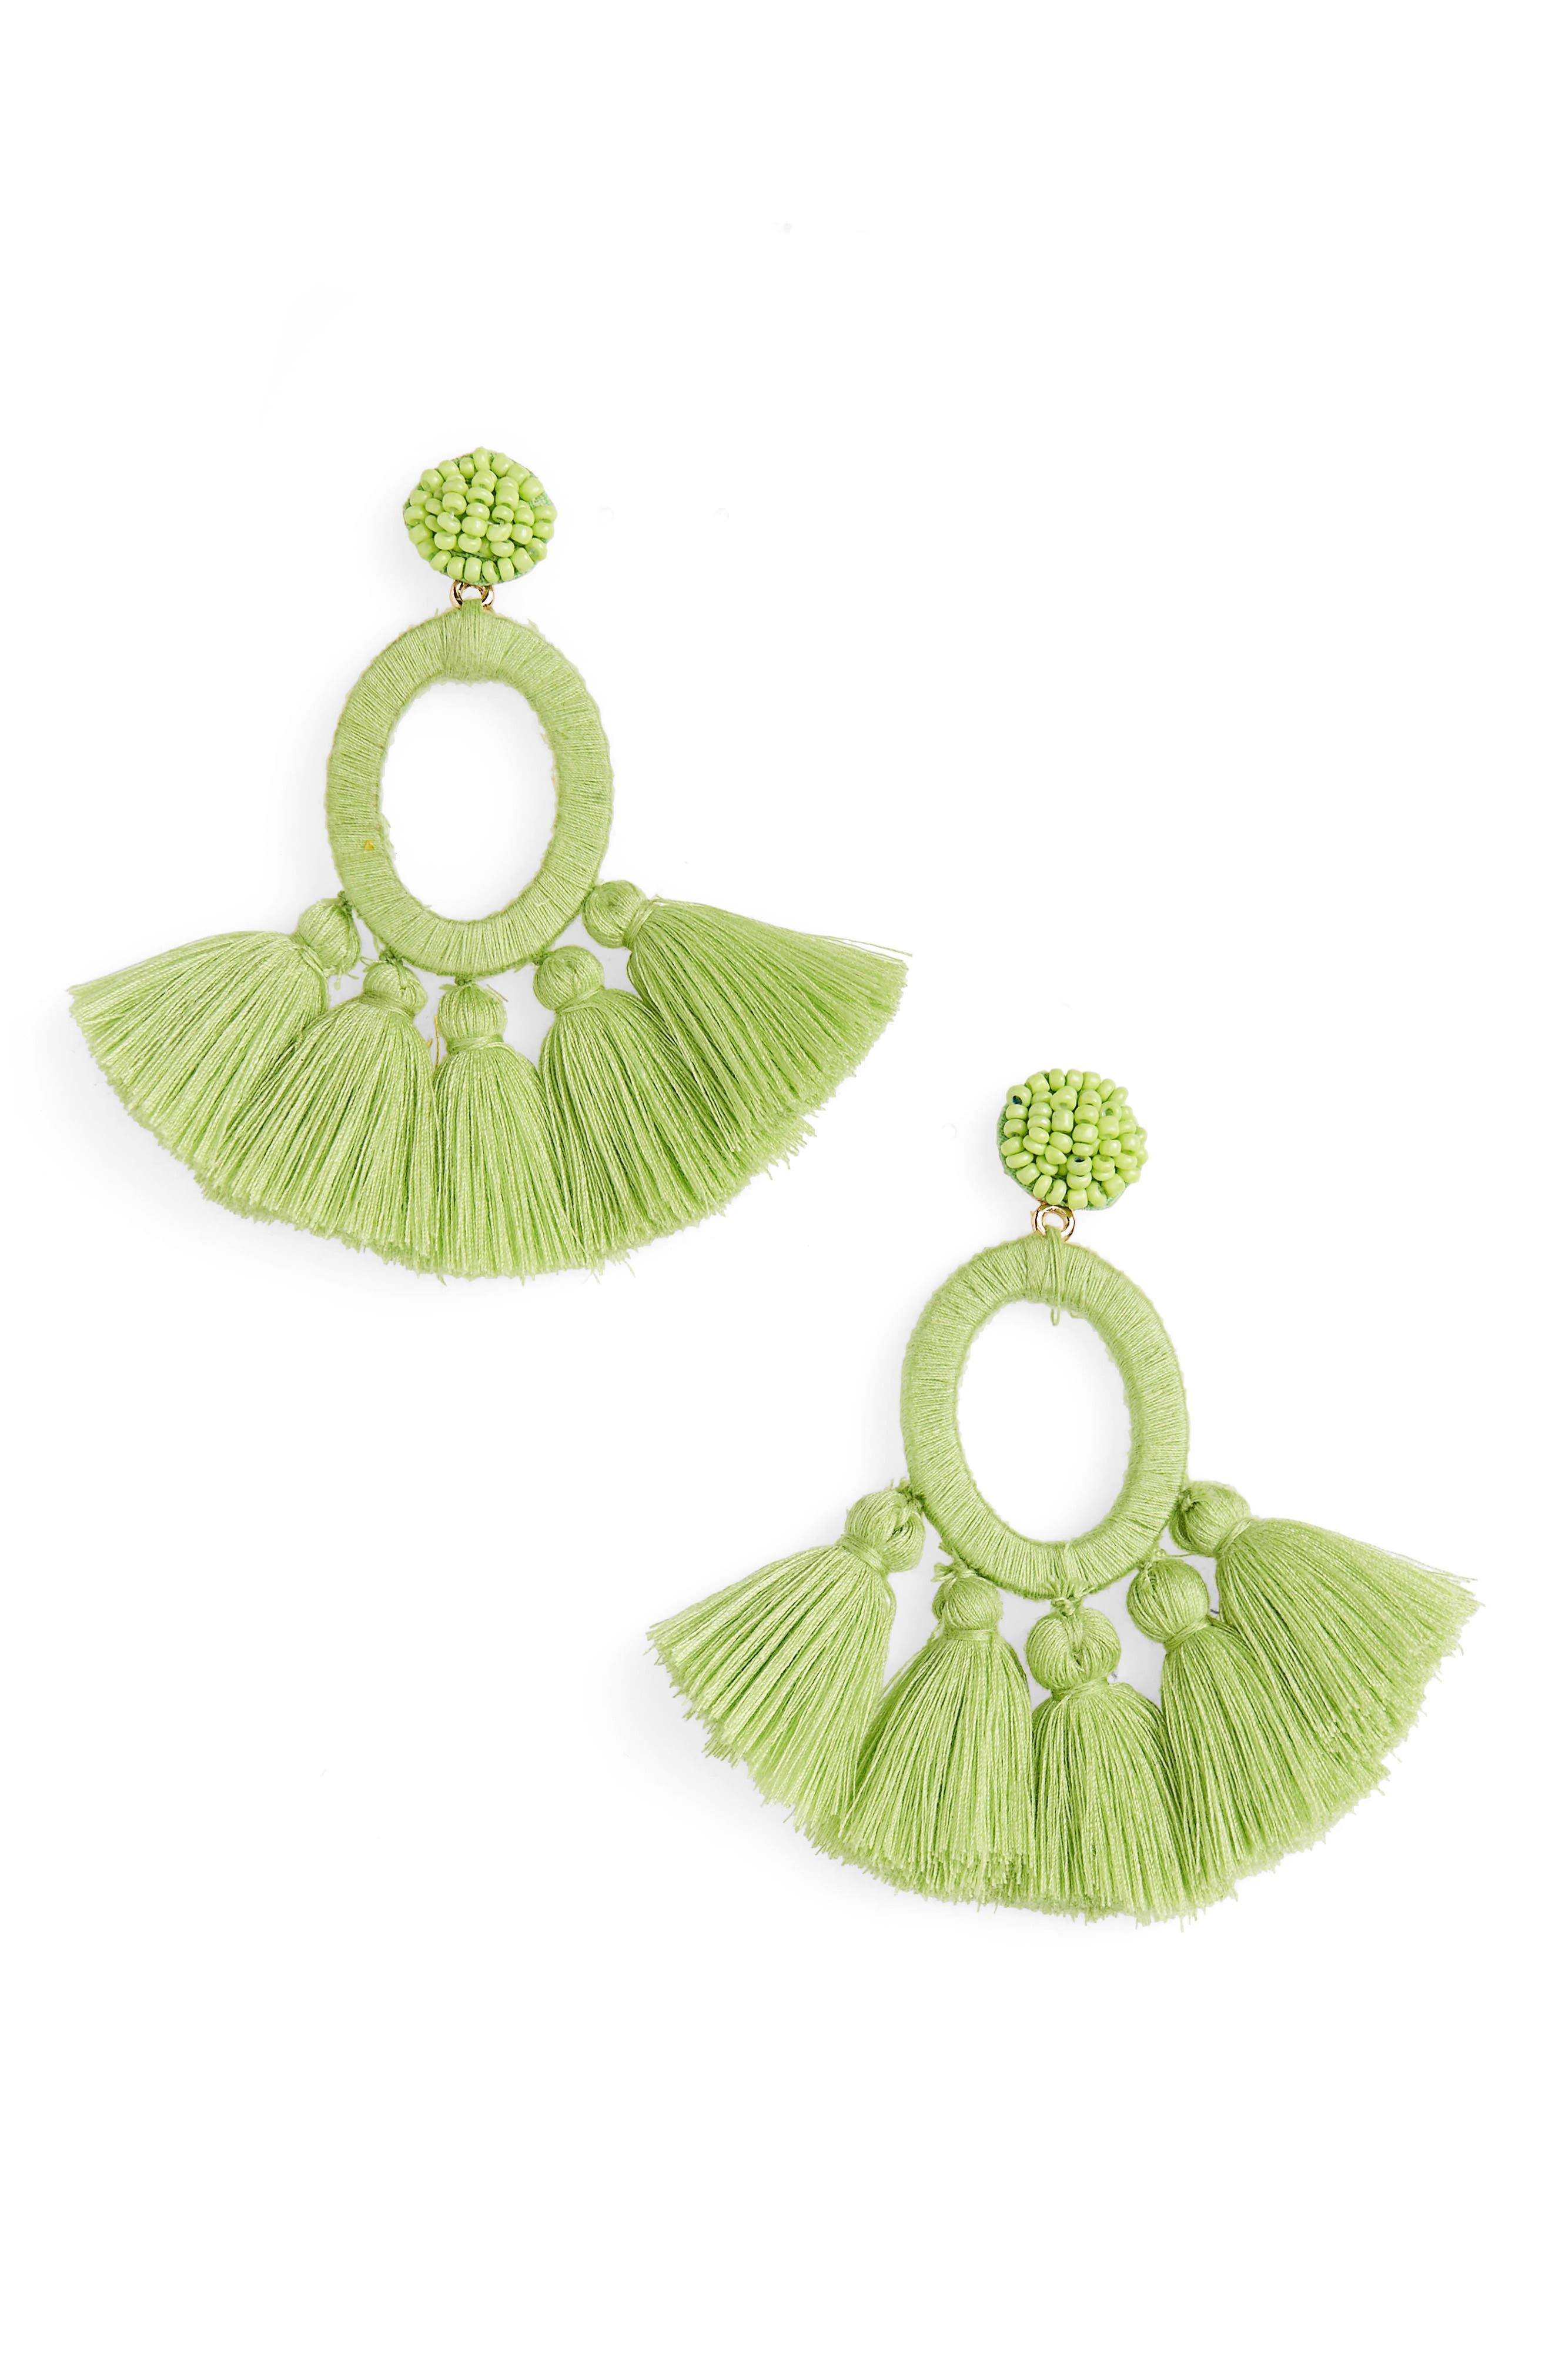 Alternate Image 1 Selected - BaubleBar Abacos Tassel Earrings